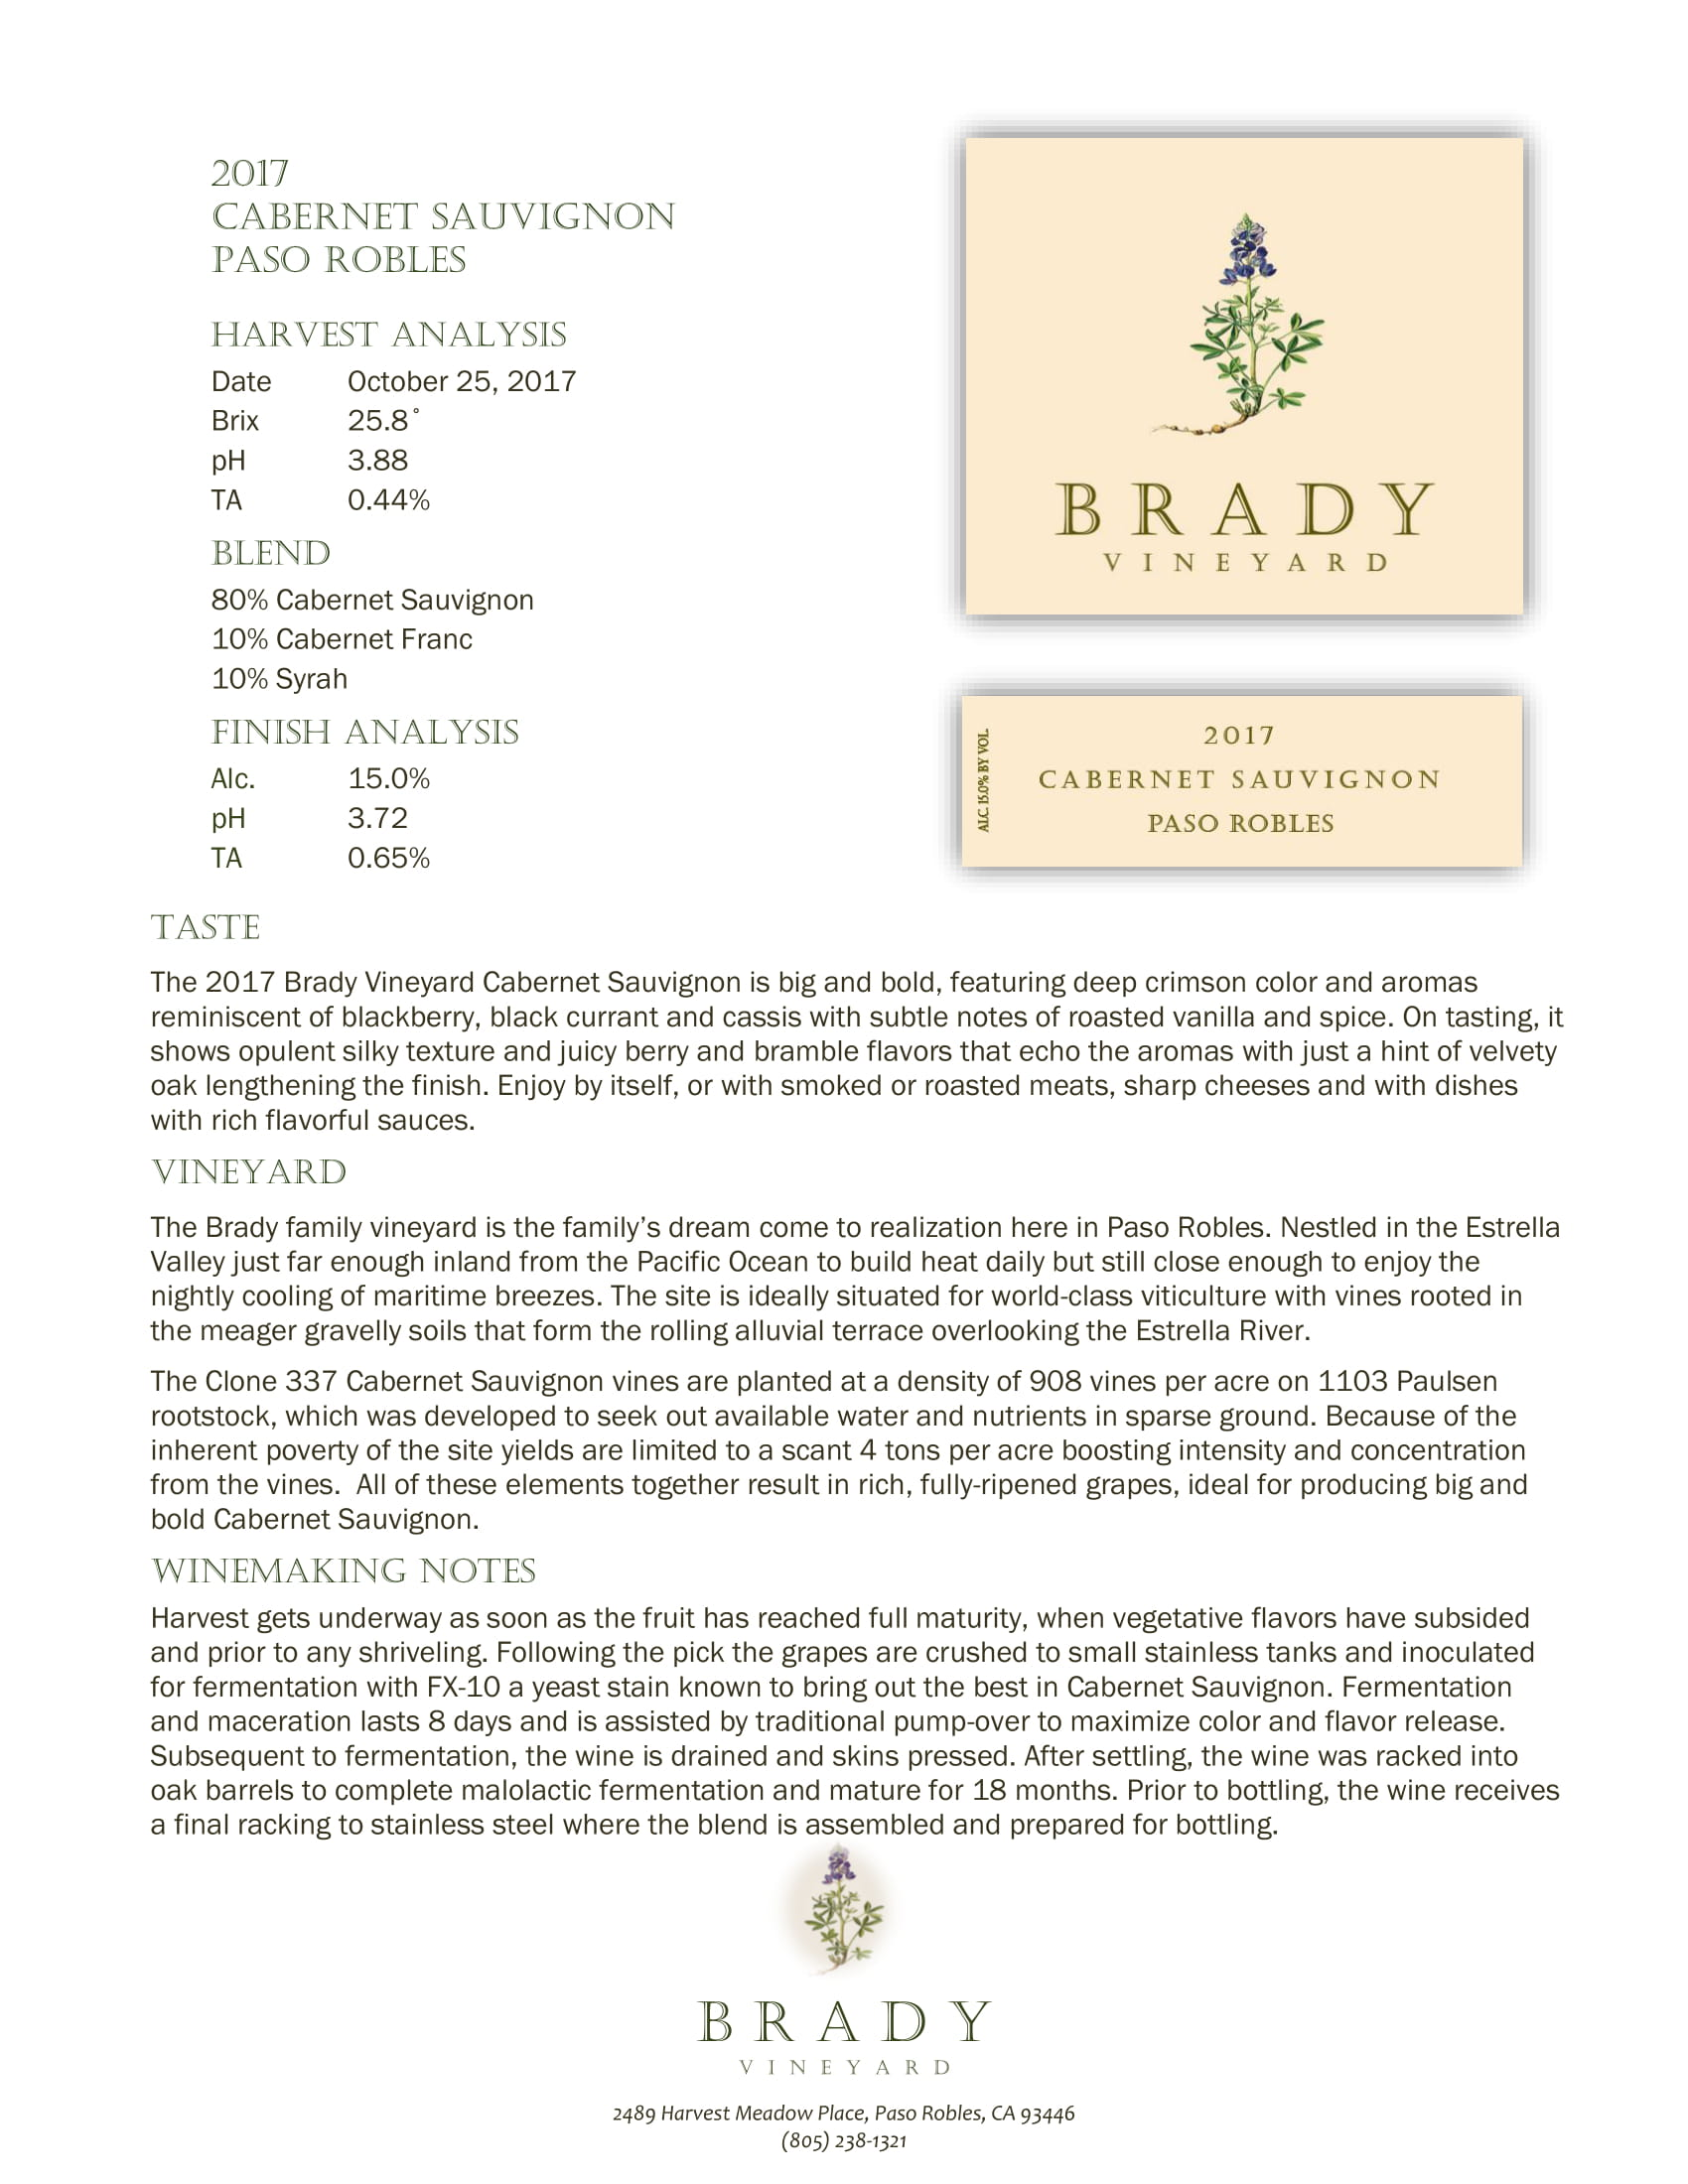 Brady Vineyards Cabernet Sauvignon Sell Sheet